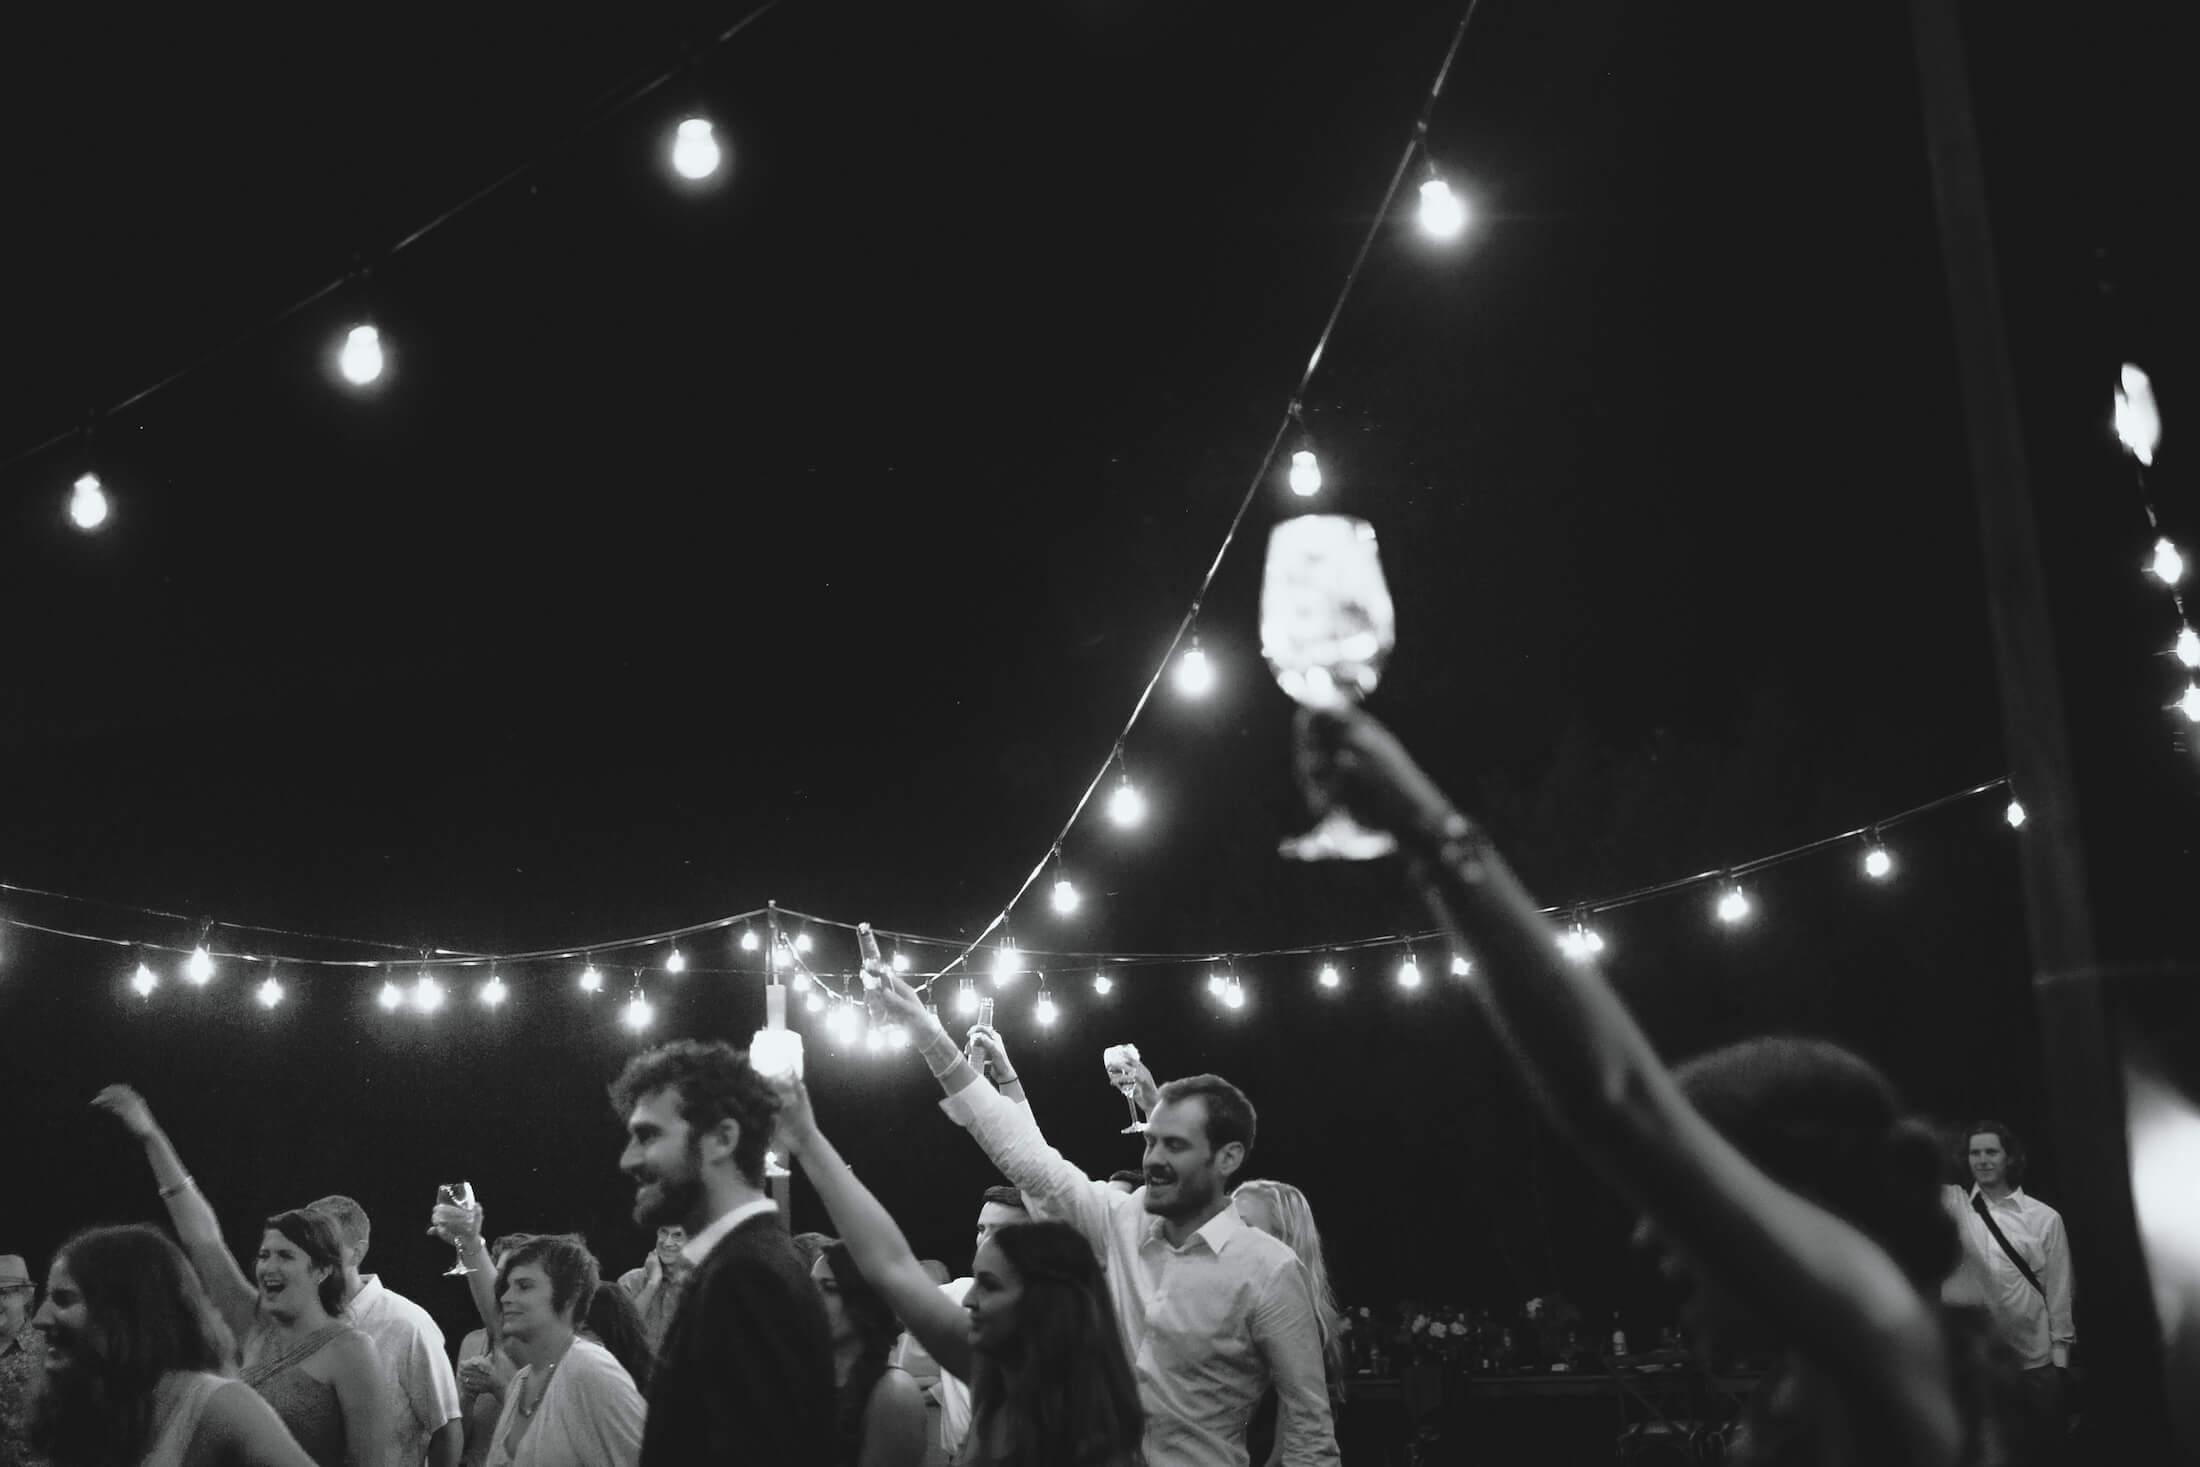 engle-olson-ray-kelly-photography-wisconsin-wedding-149.jpg